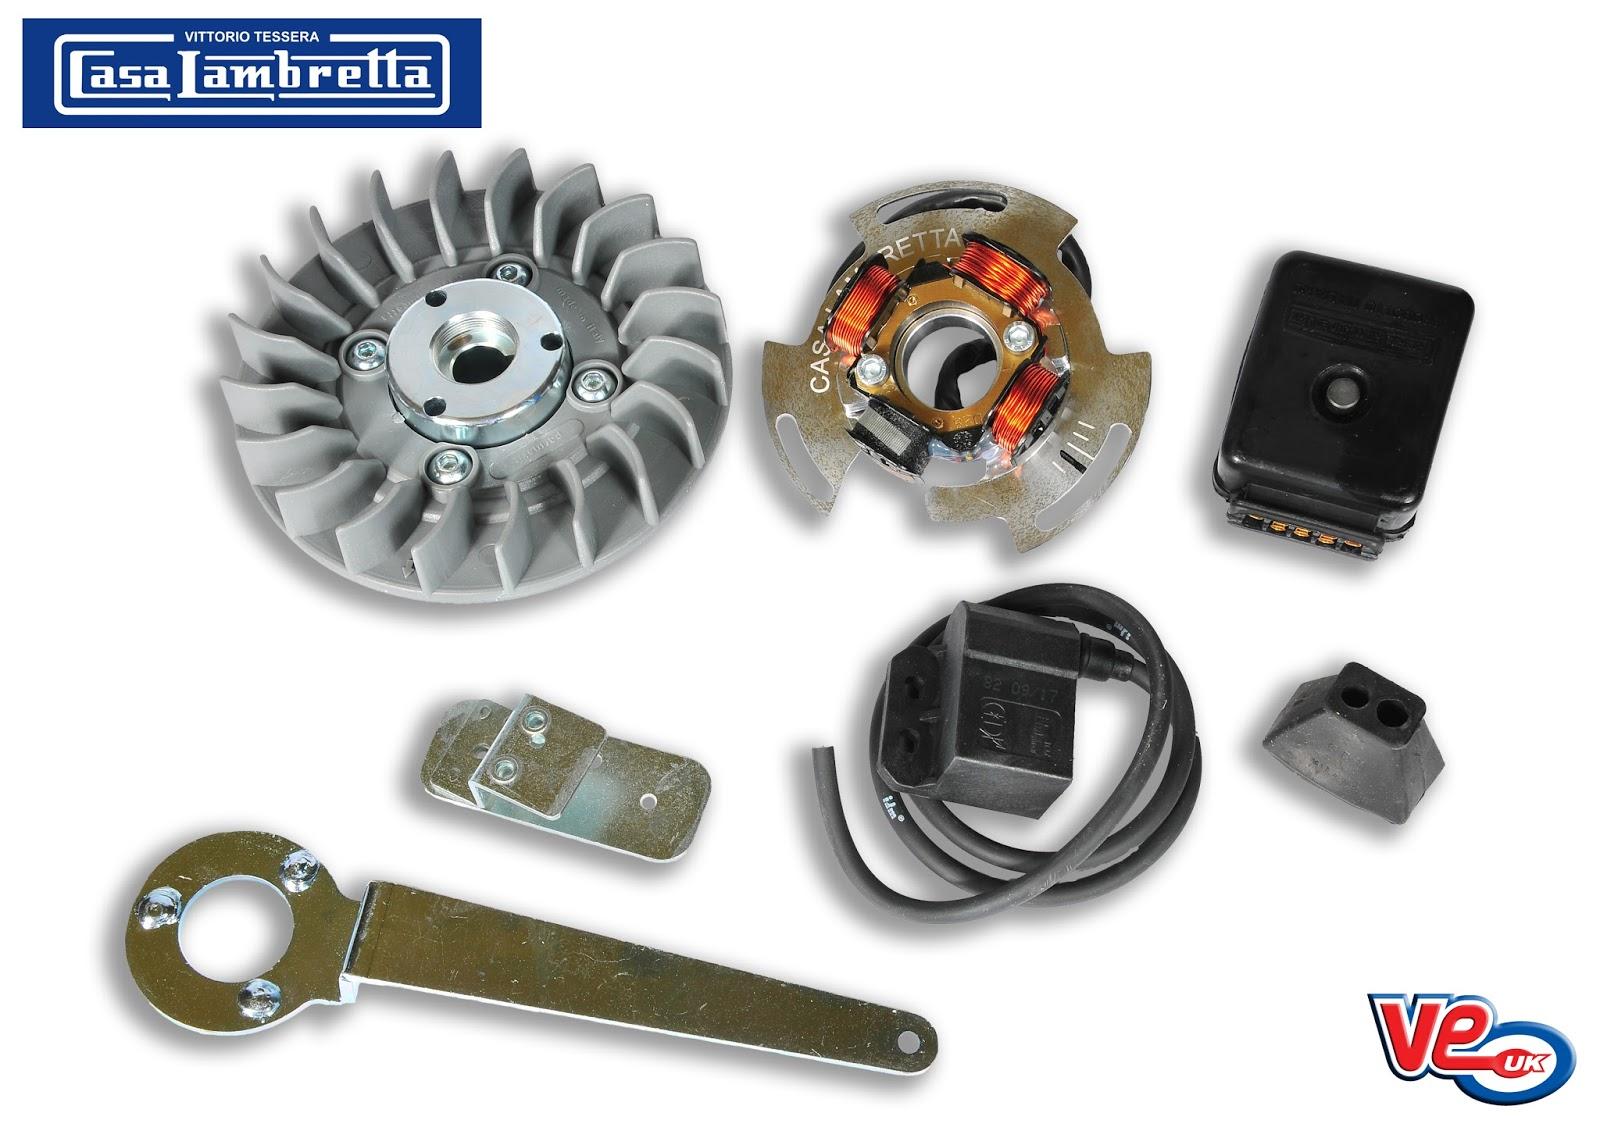 Casa Lambretta Casatronic kits